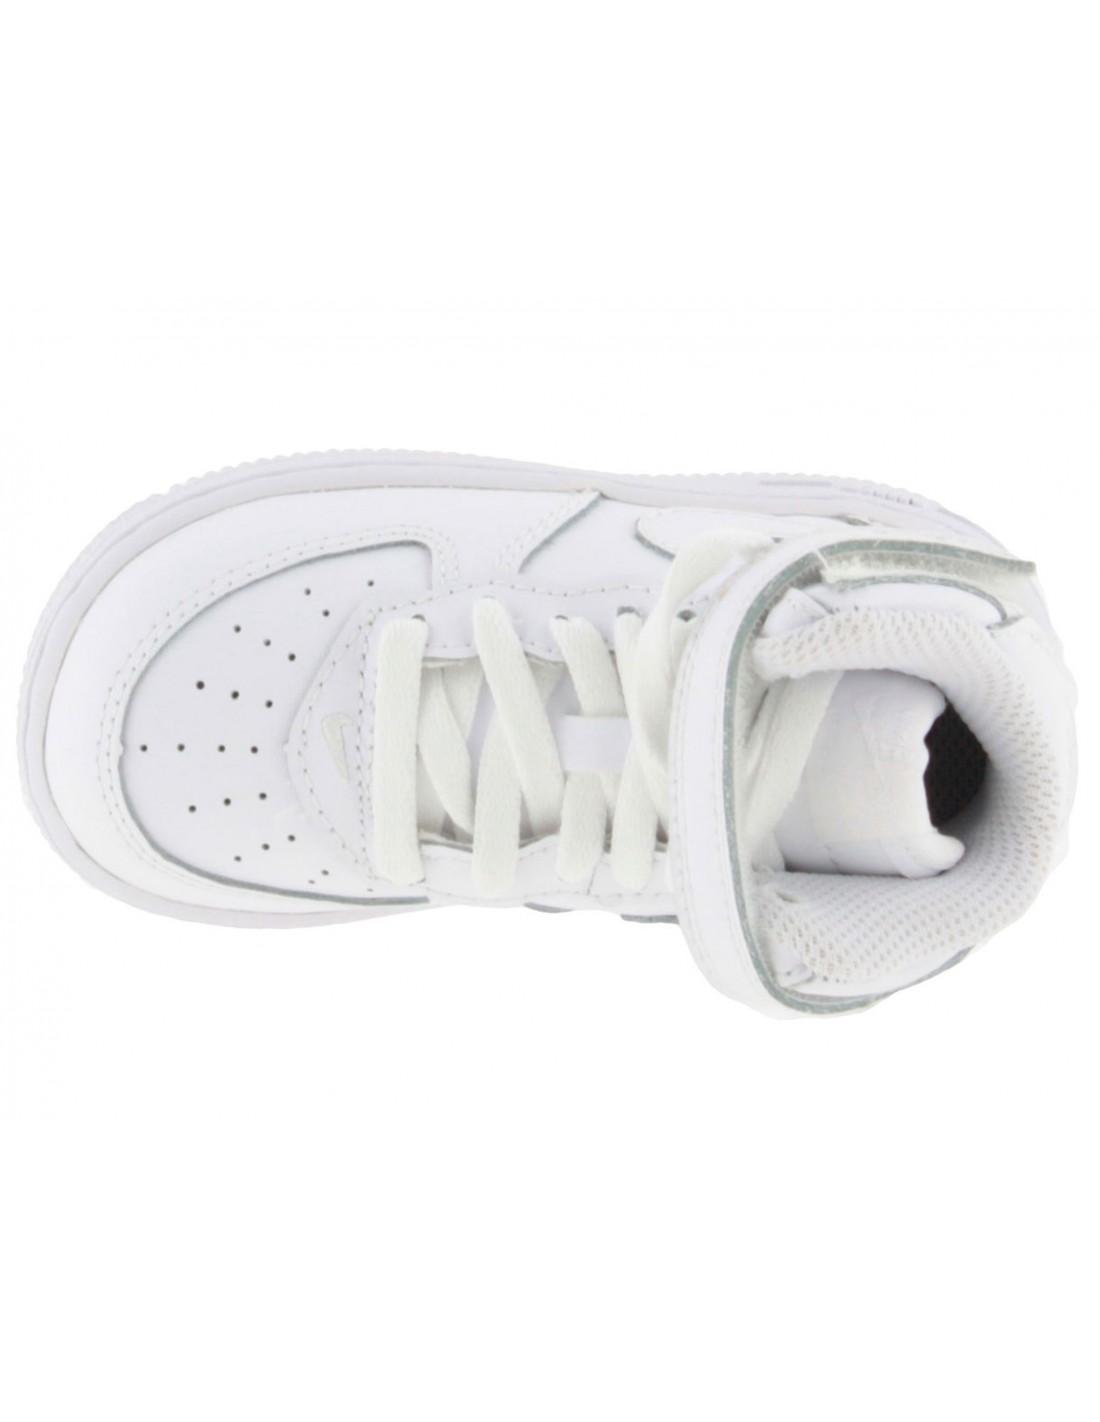 Nike Air force 1 mid td scarpe ginnastica alte bambino 314197113